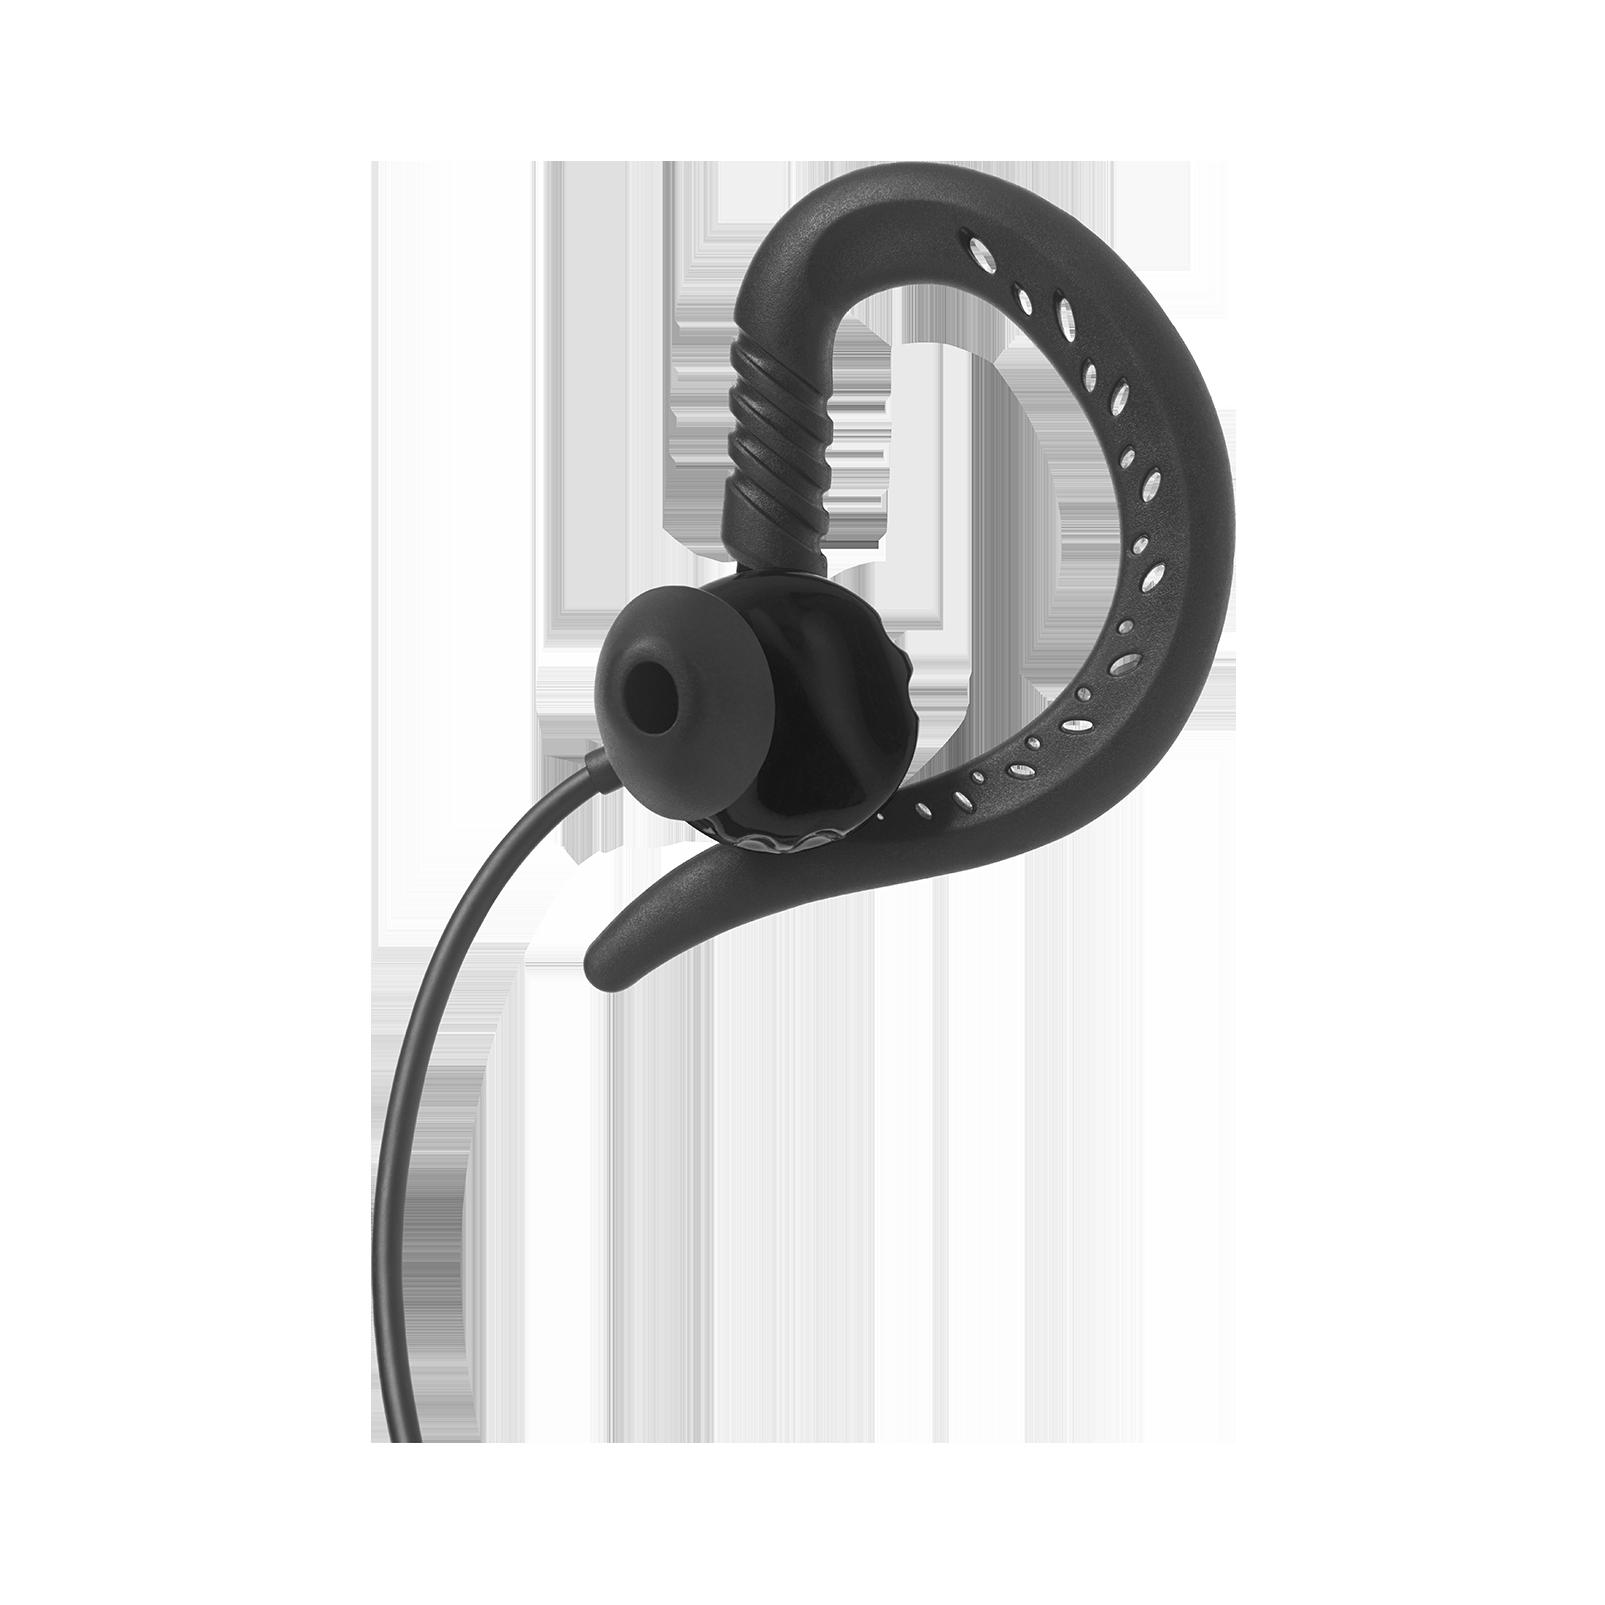 164a158d96f JBL Focus 300 | Behind-the-ear, sport headphones with Twistlock ...